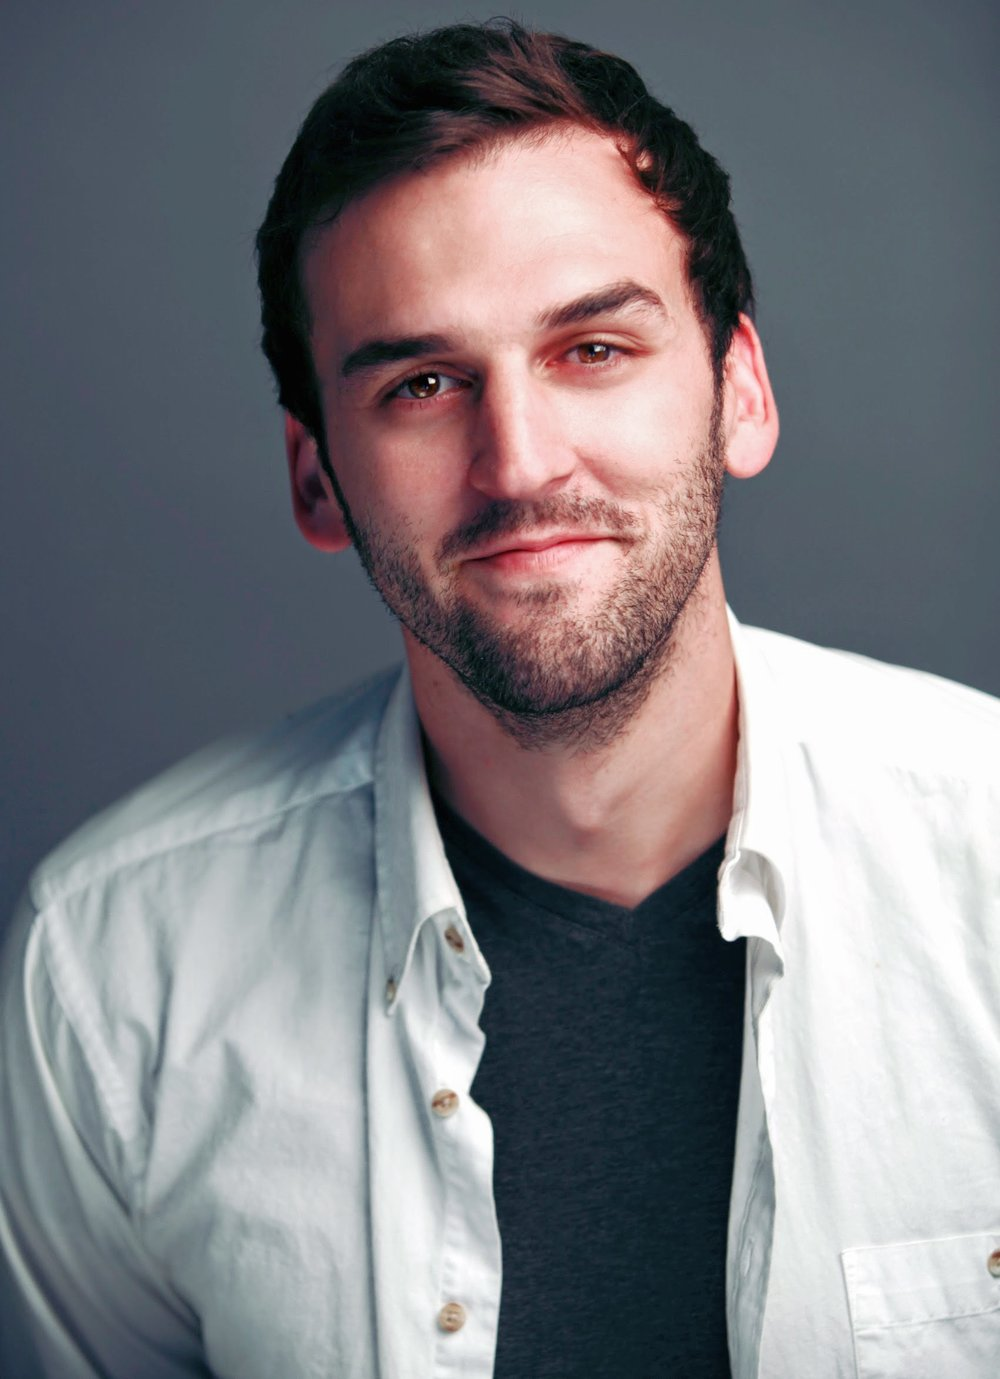 Lucas Kavner